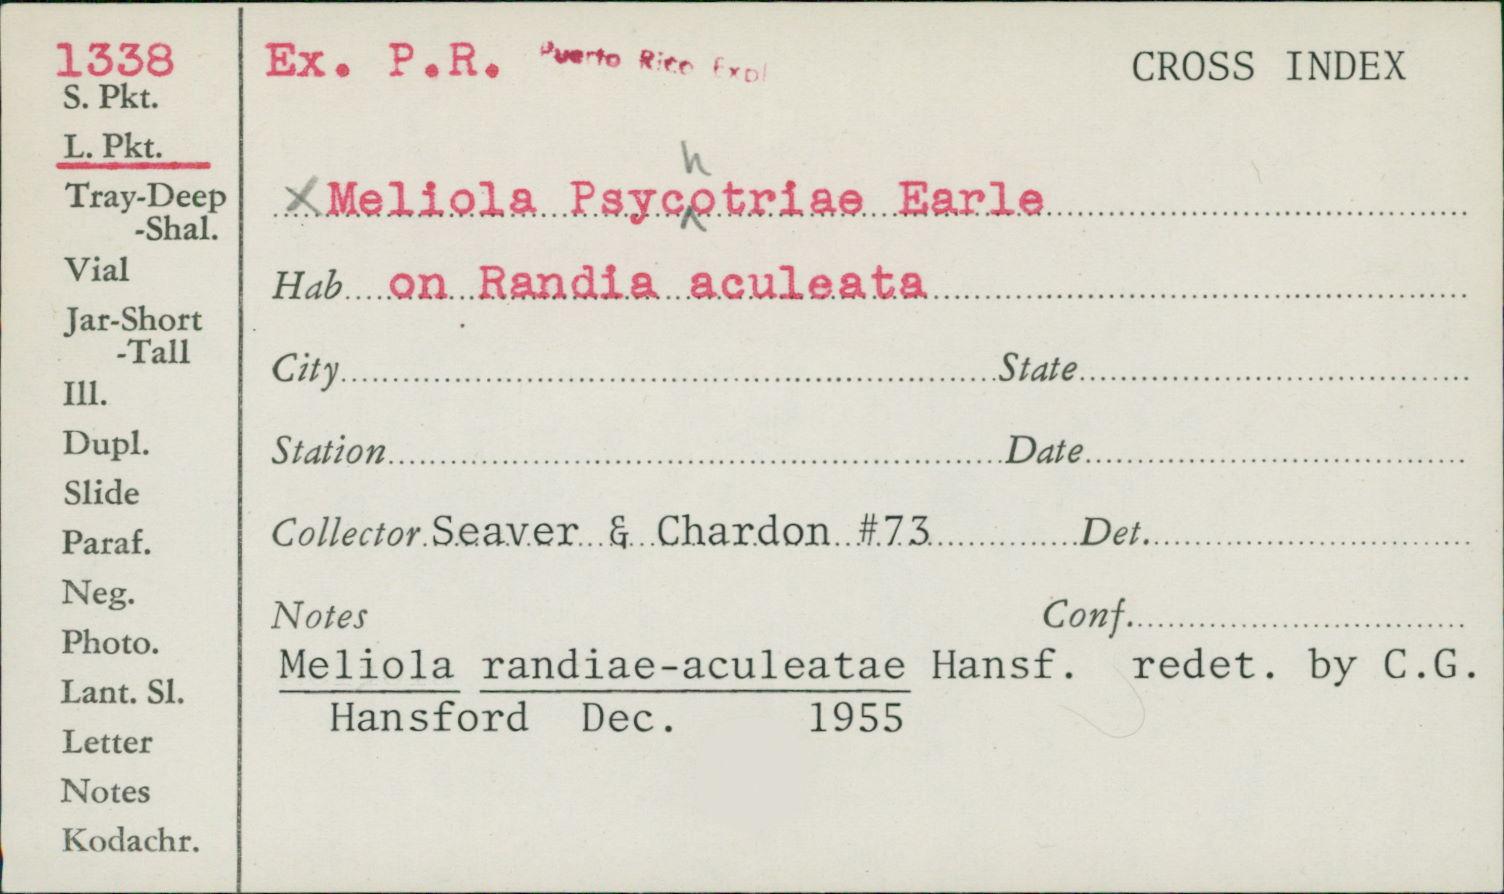 Meliola randiae-aculeatae image